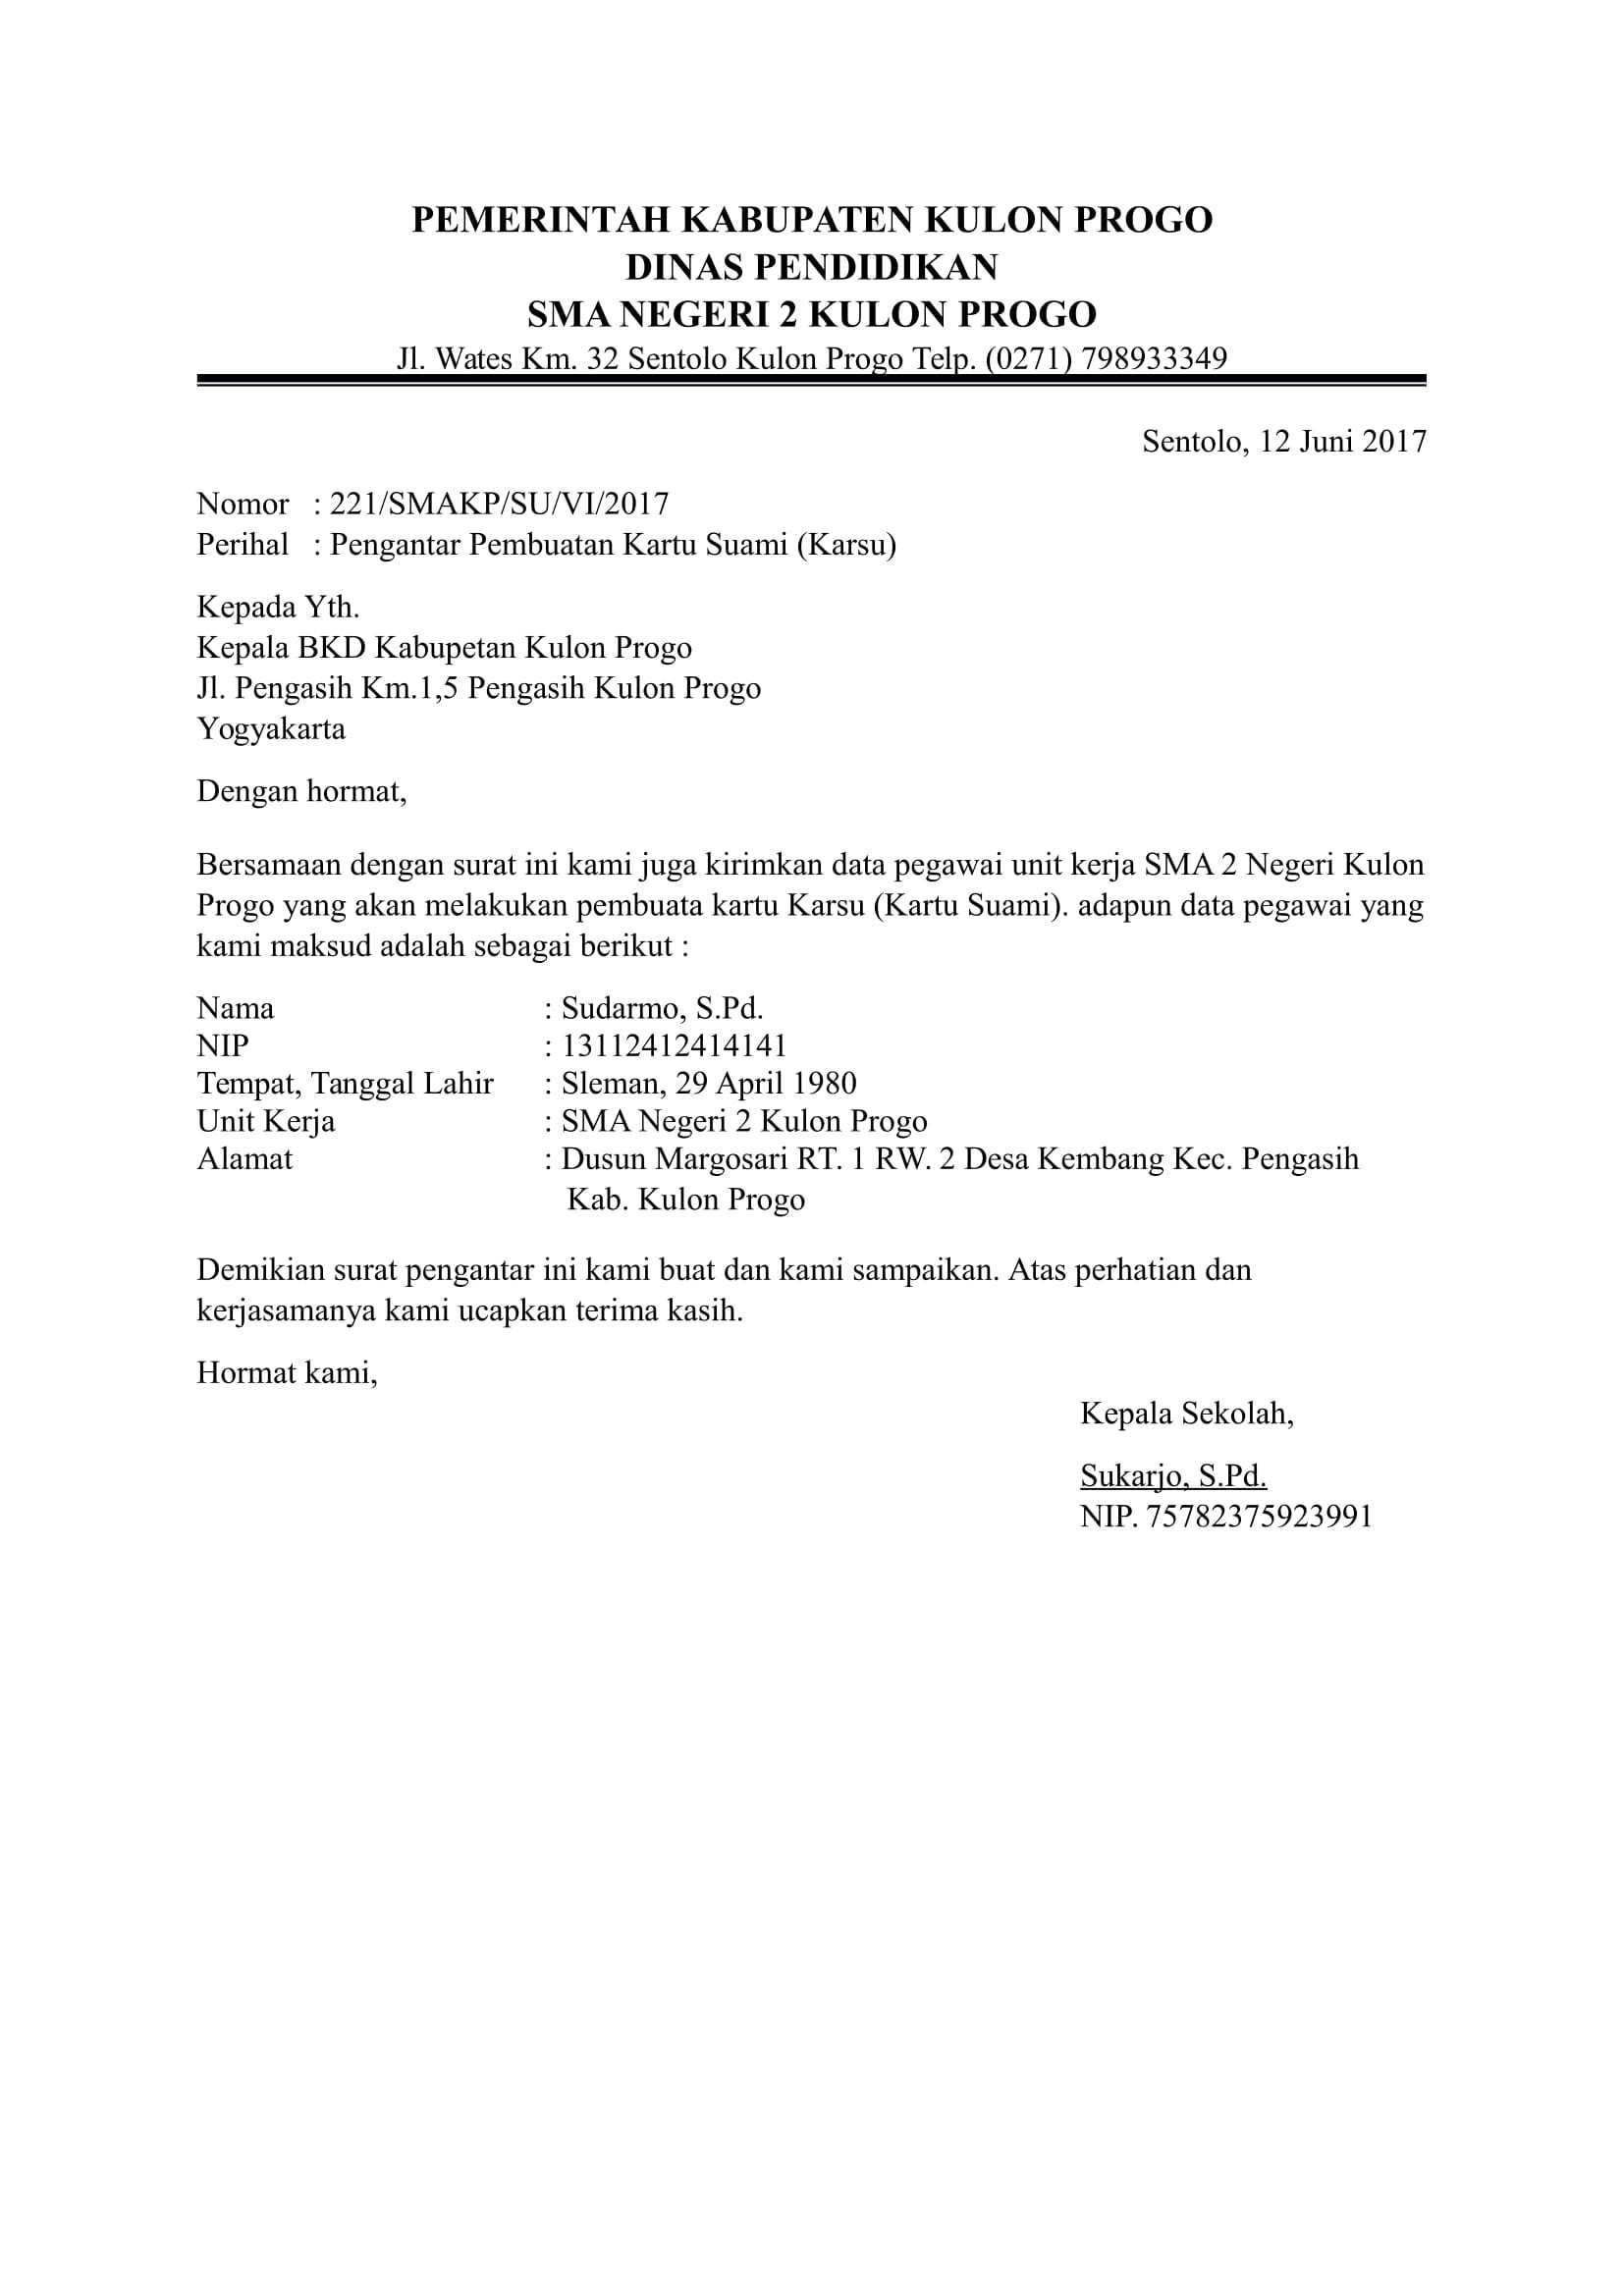 Surat Pengantar Dokumen : surat, pengantar, dokumen, Contoh, Surat, Pengantar, Kepala, Sekolah, Sekolah,